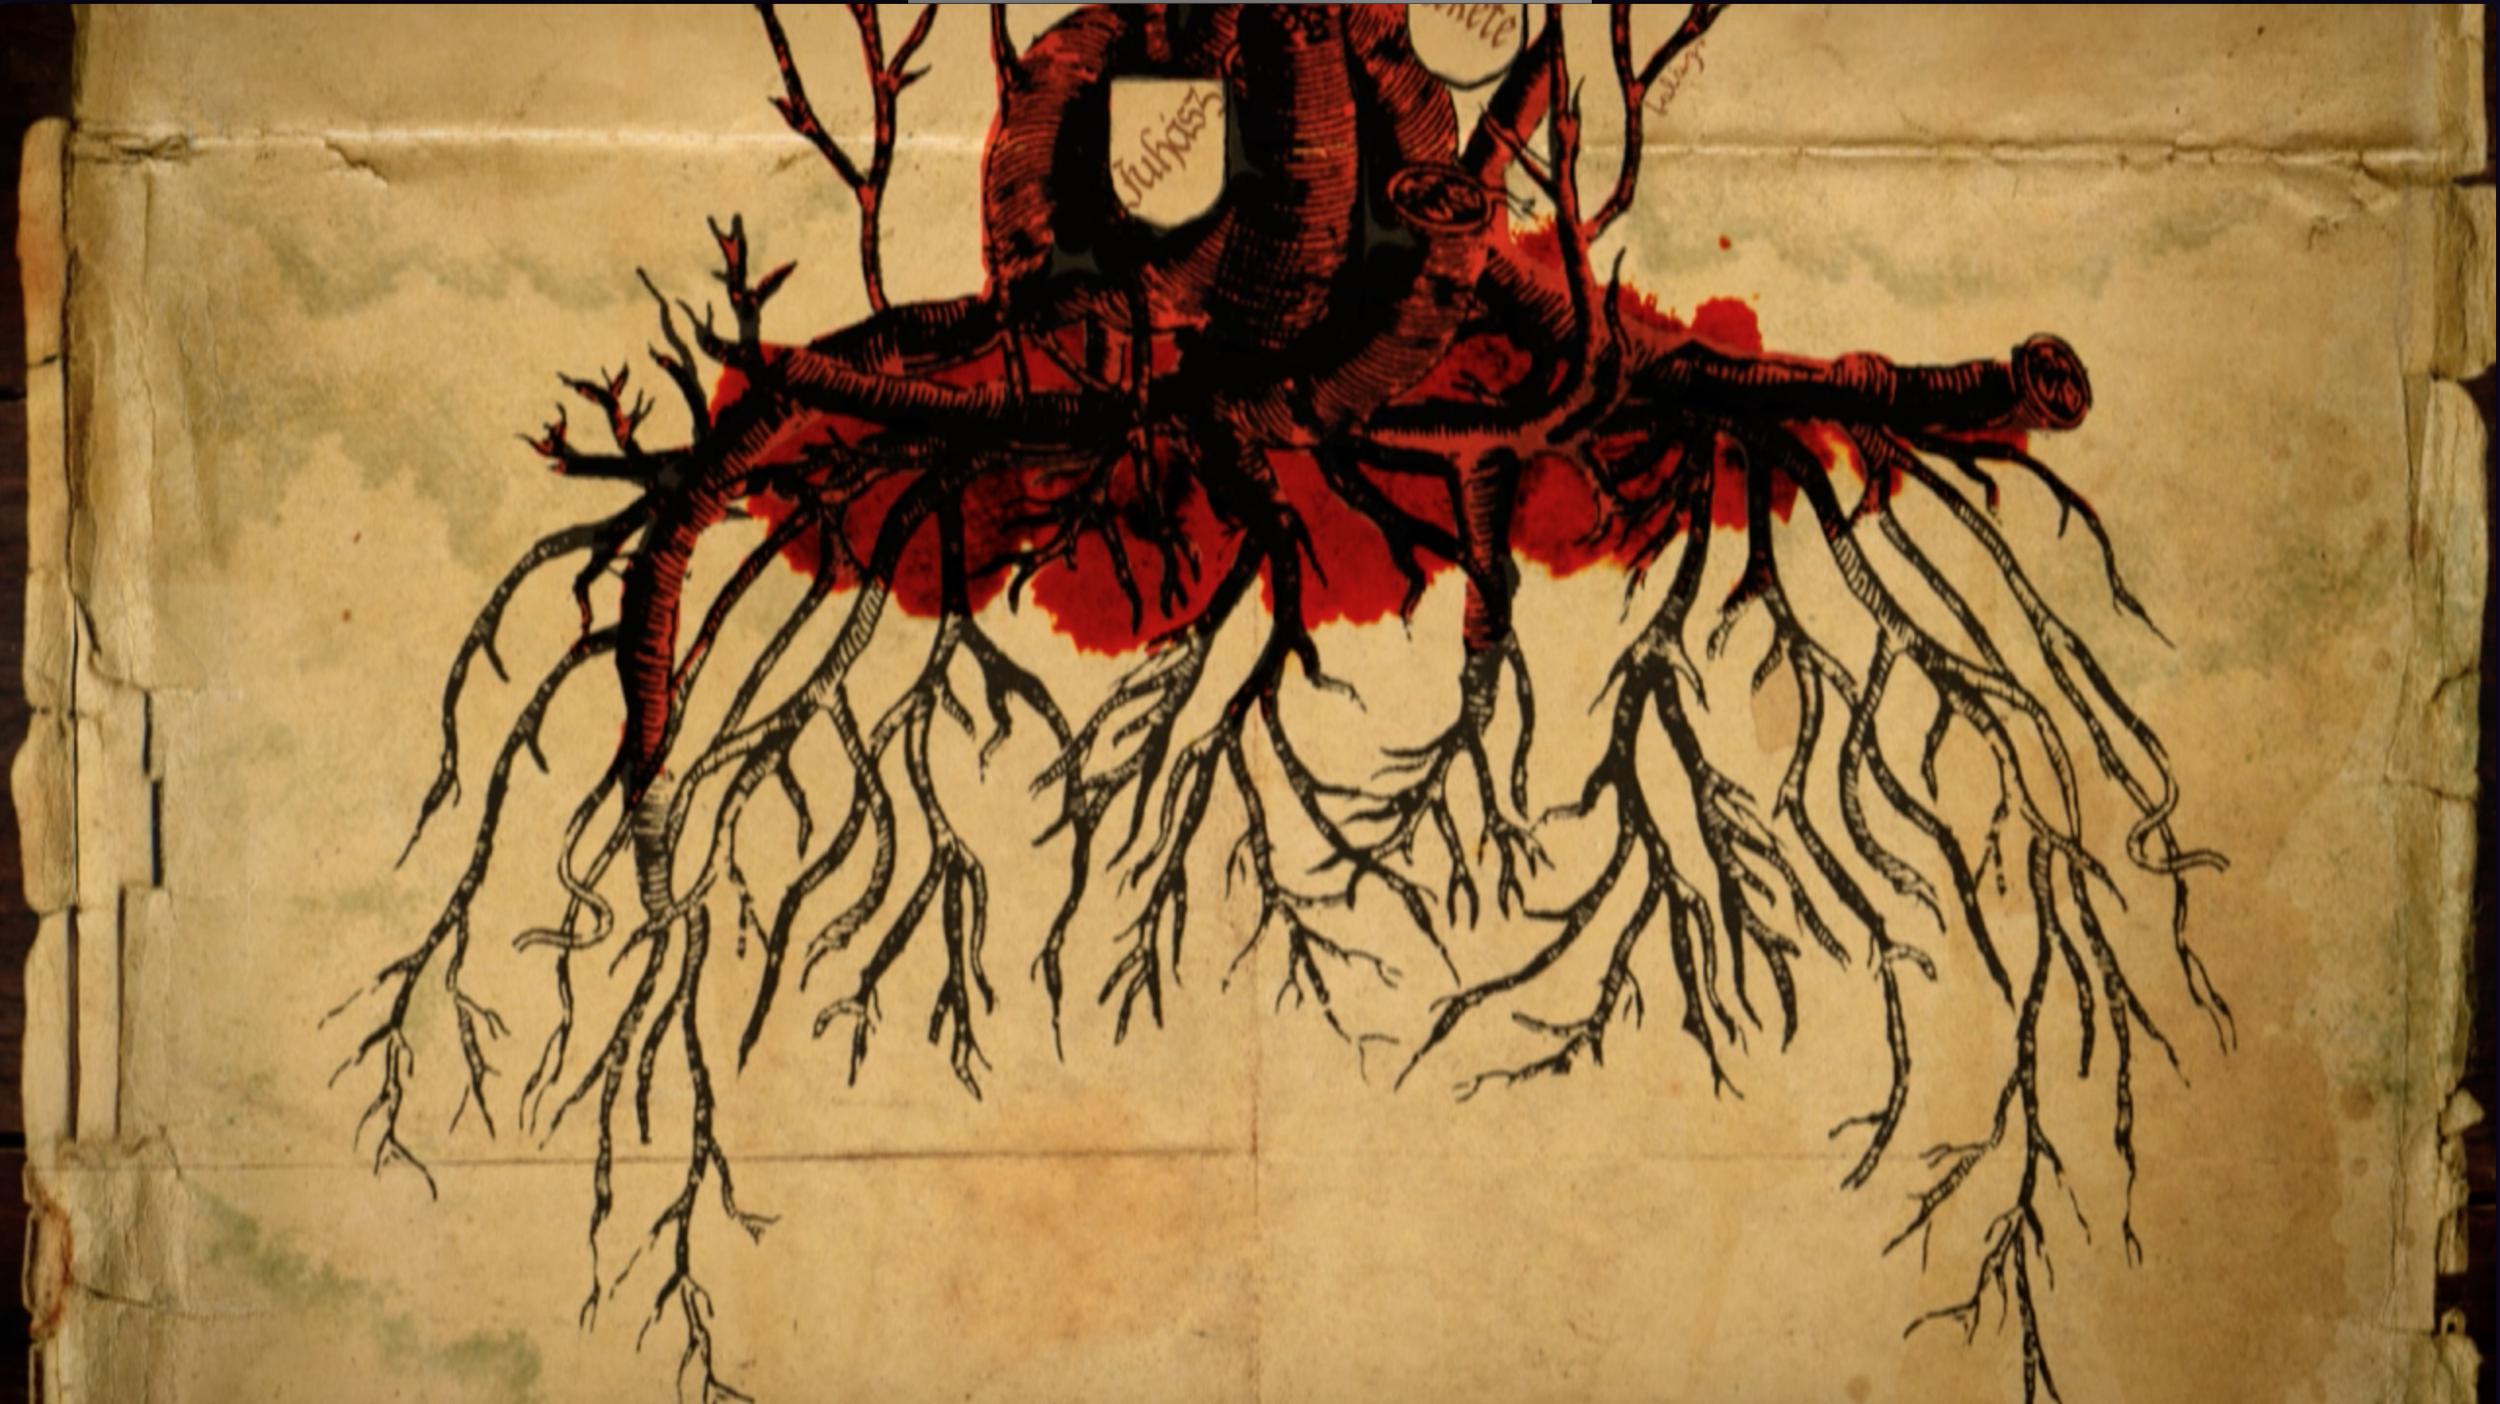 mulholland books teaser - Written in the blood